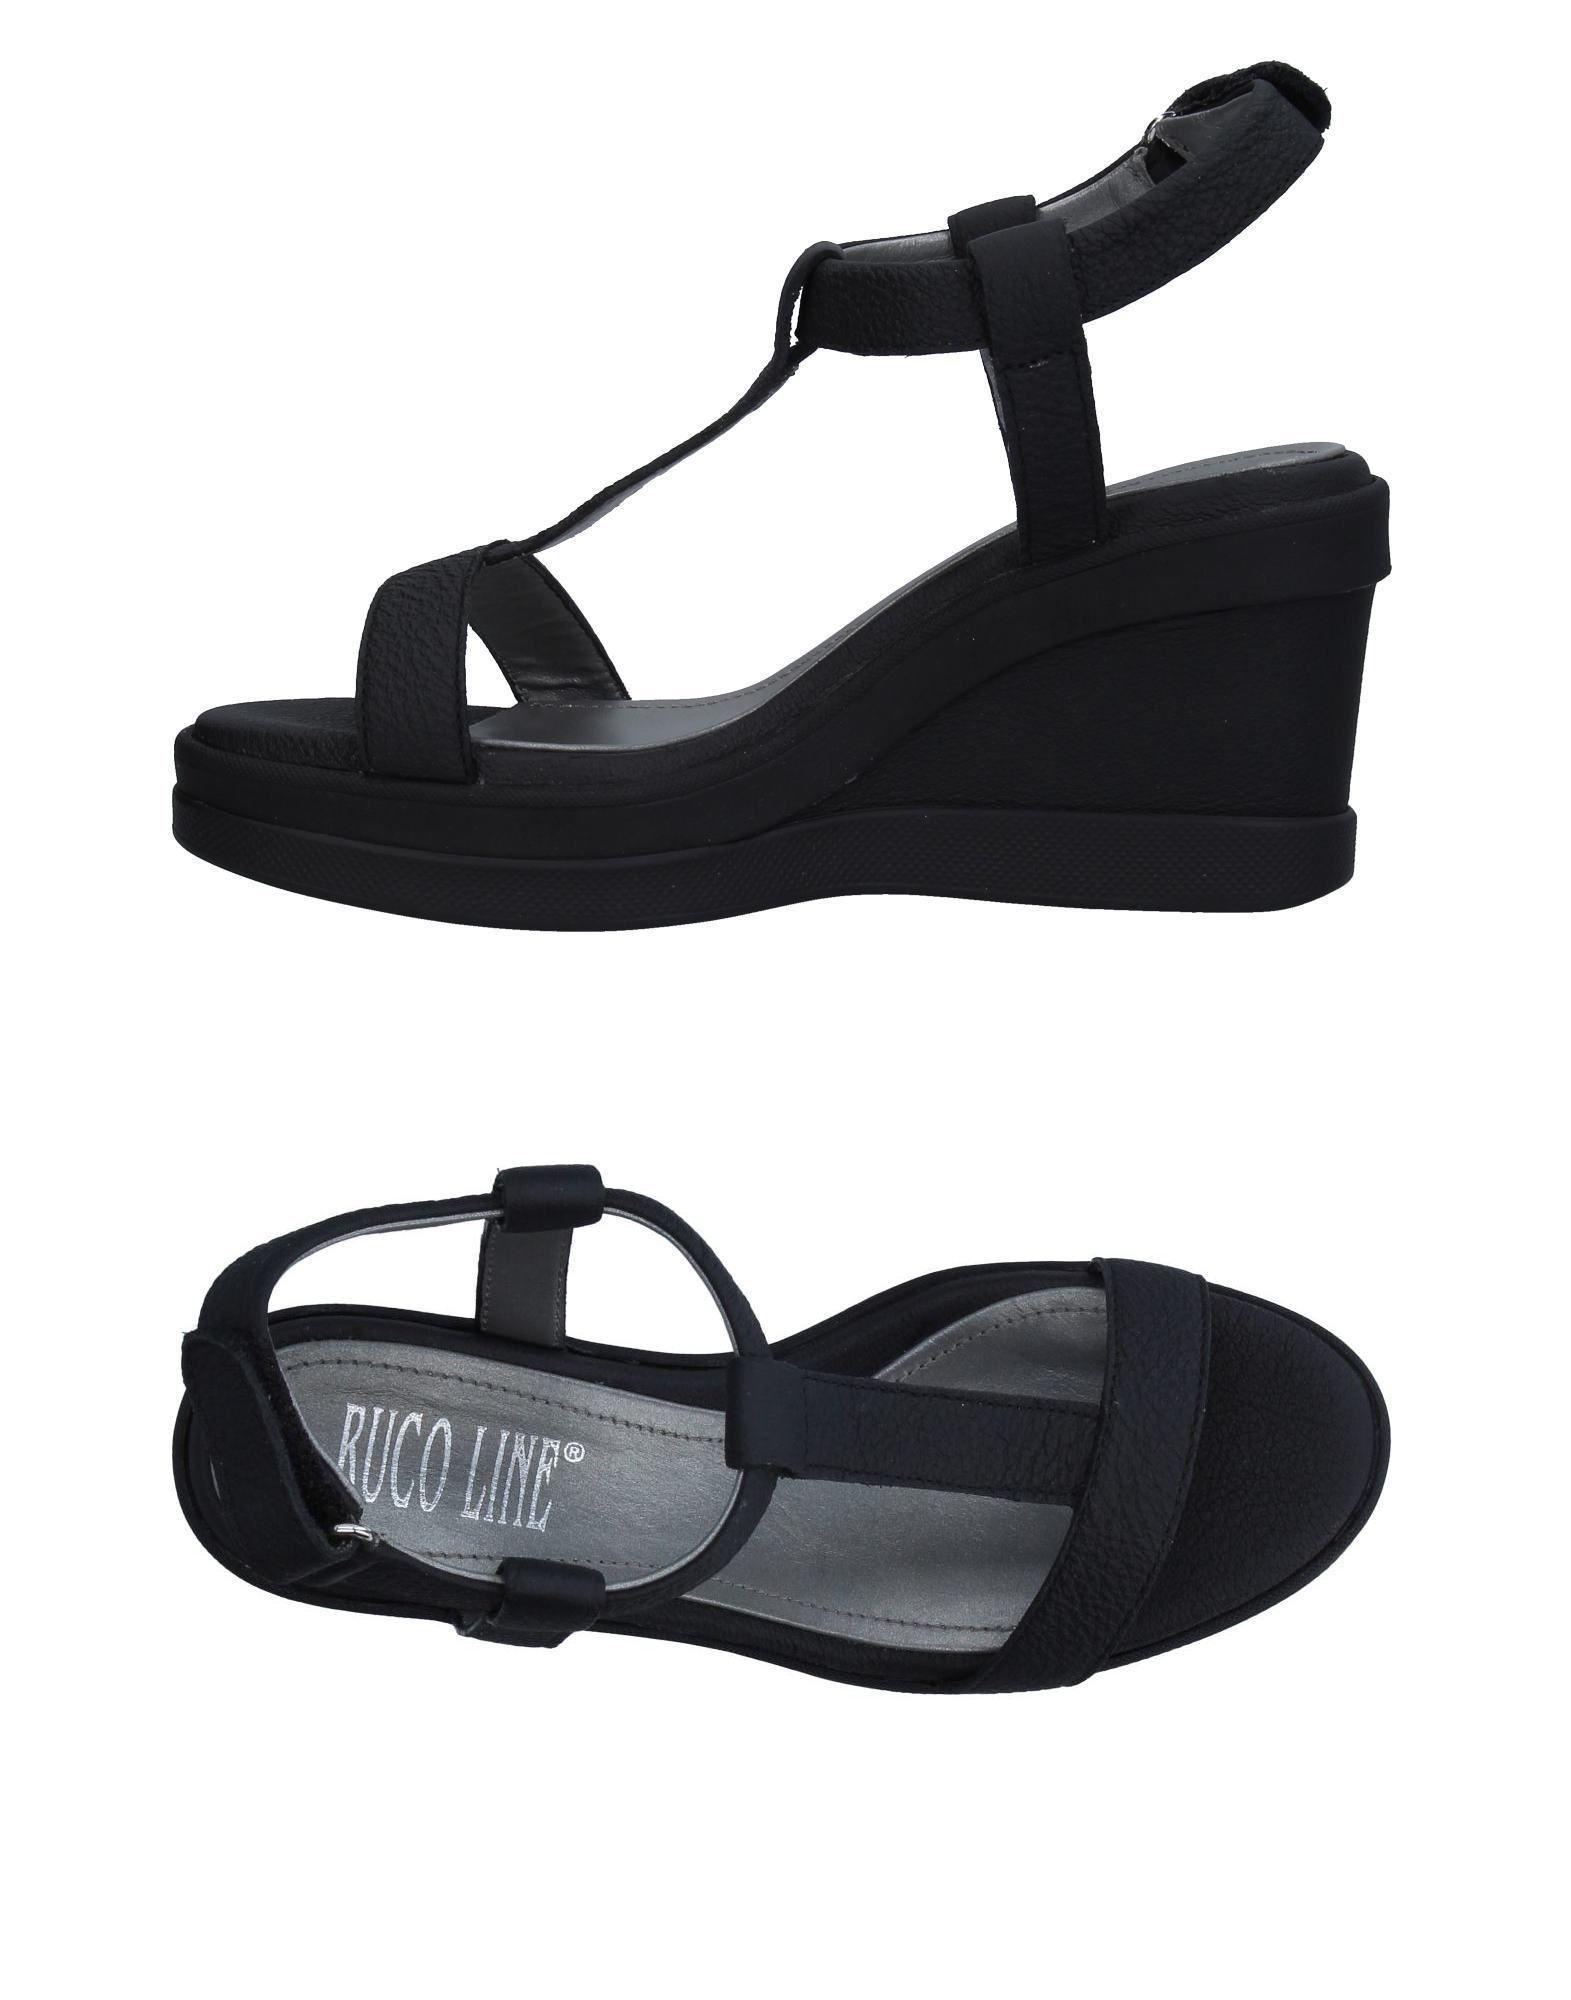 Ruco Line Sandalen Damen  11335238DB Gute Qualität beliebte Schuhe